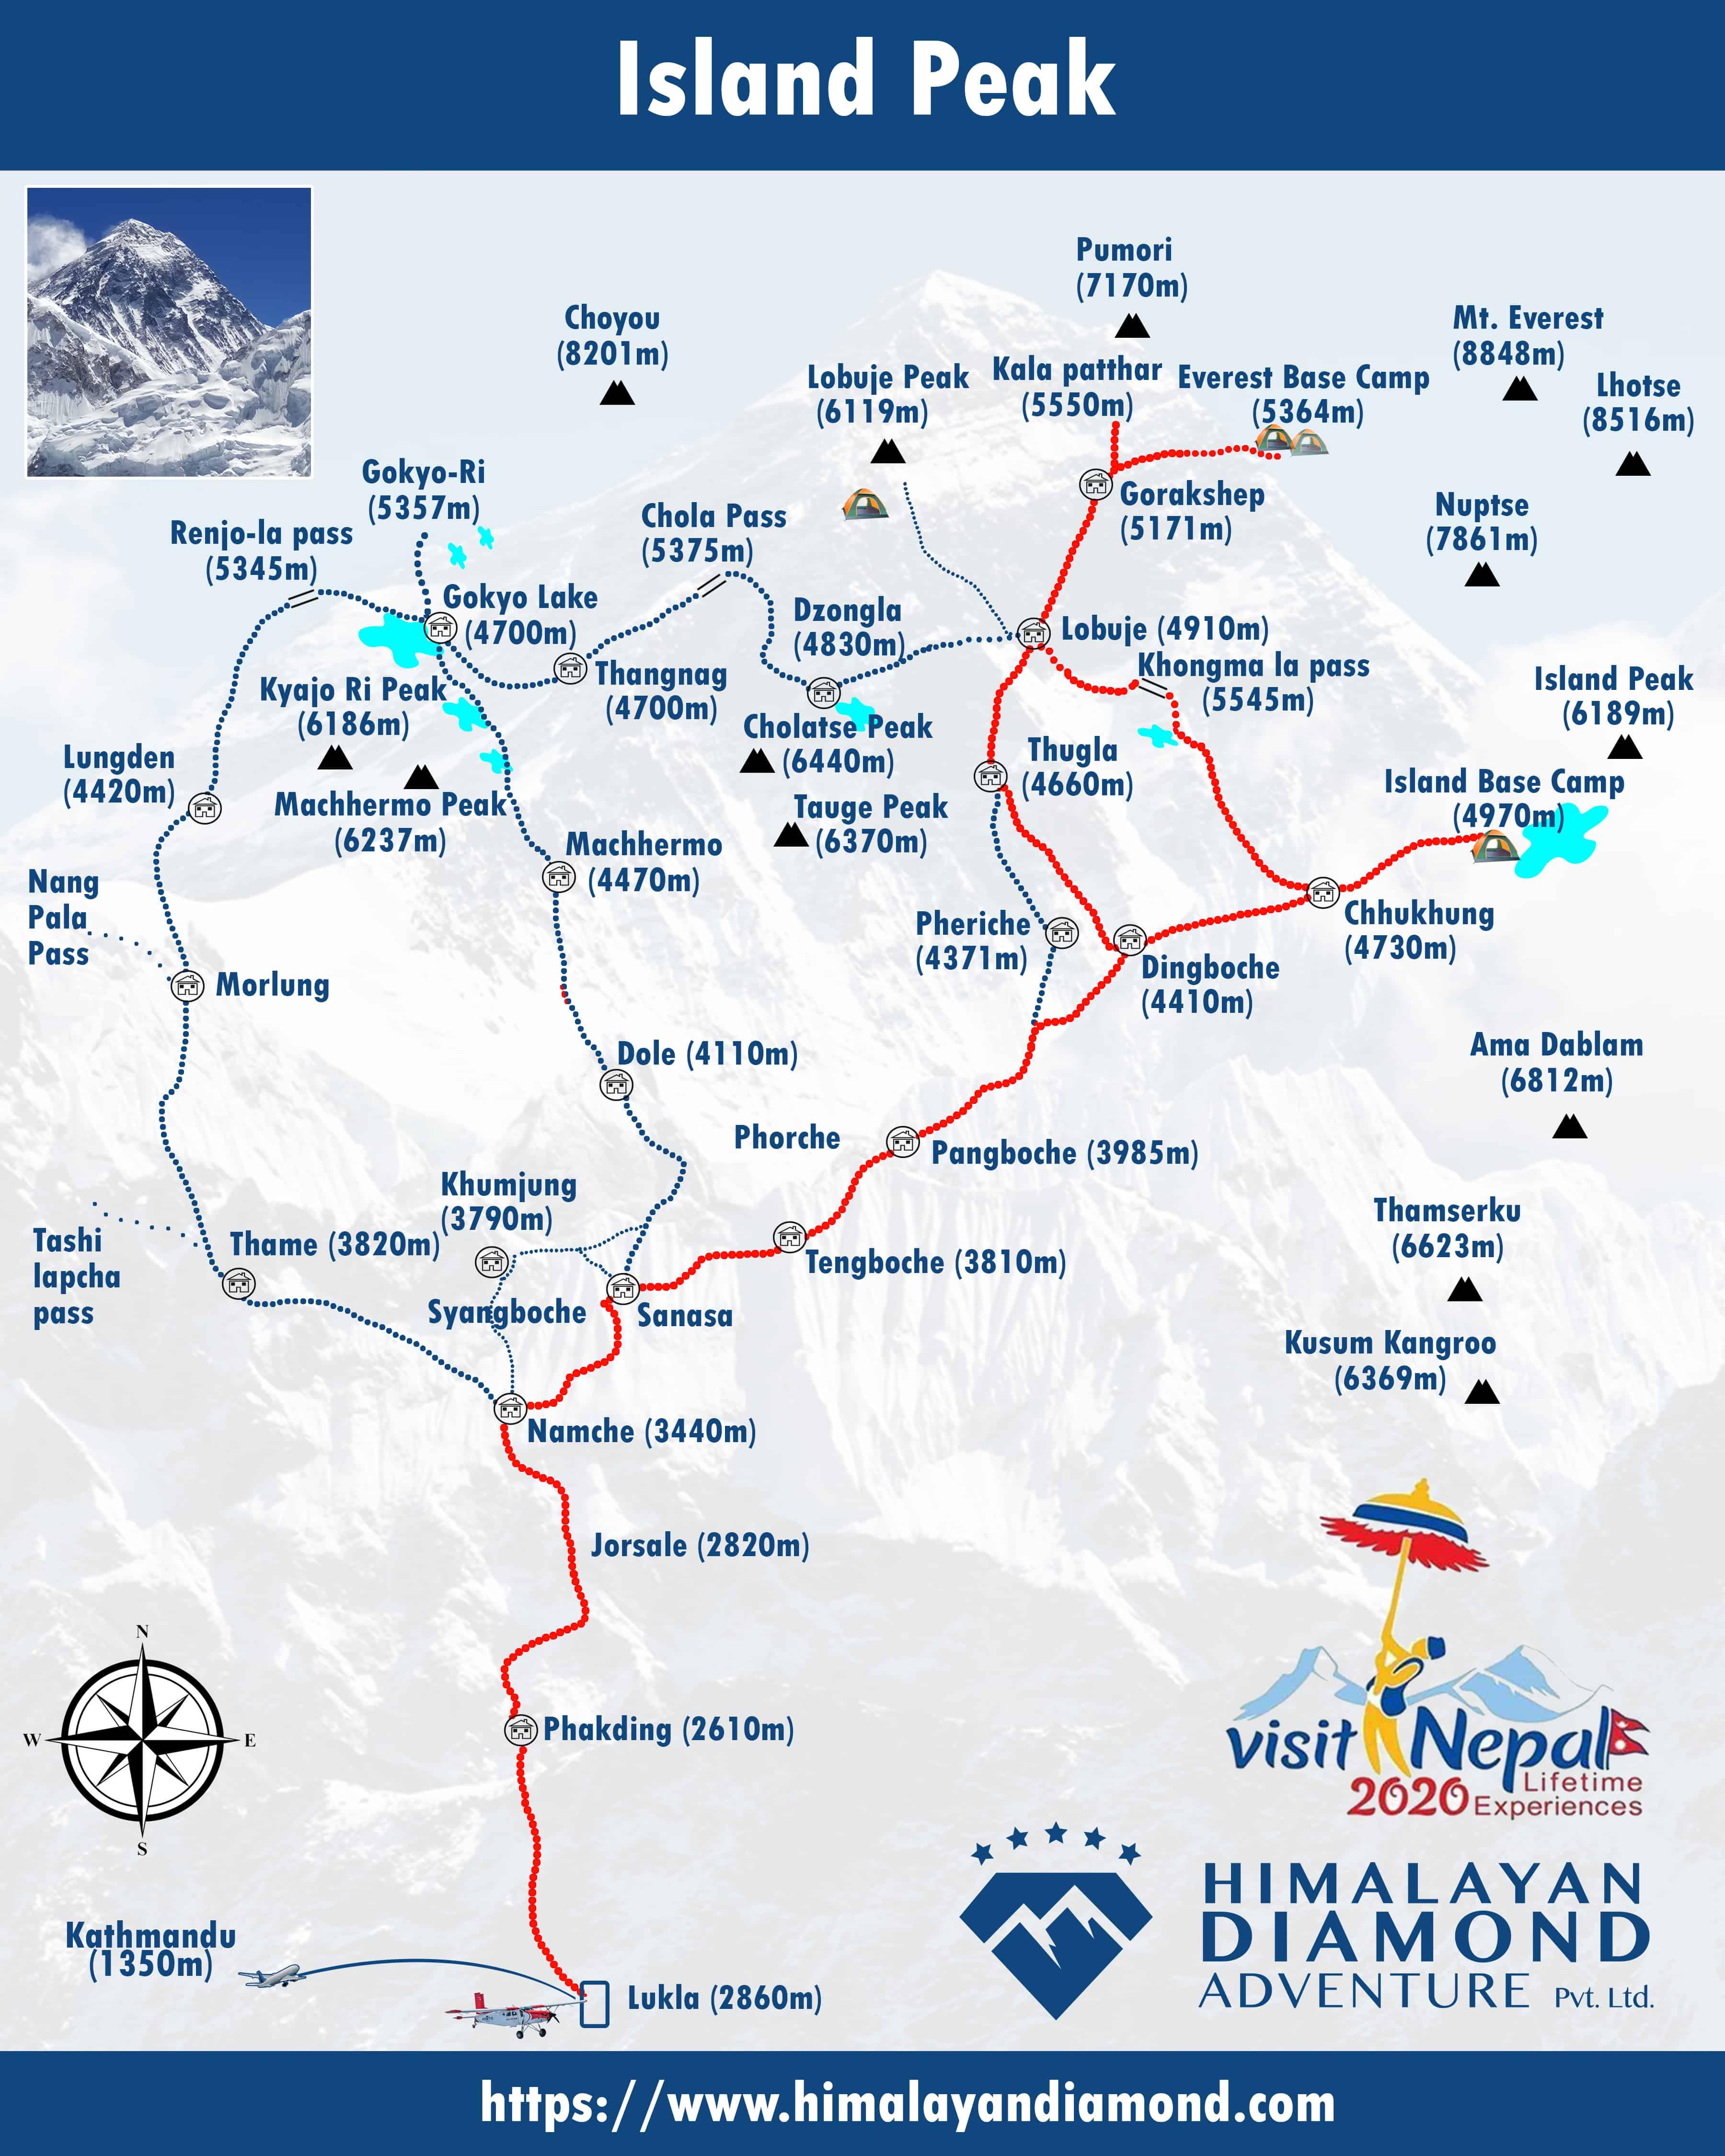 Island (Imja-Tse) Peak Climbing [6,189 meters/ 20,305 ft] Map